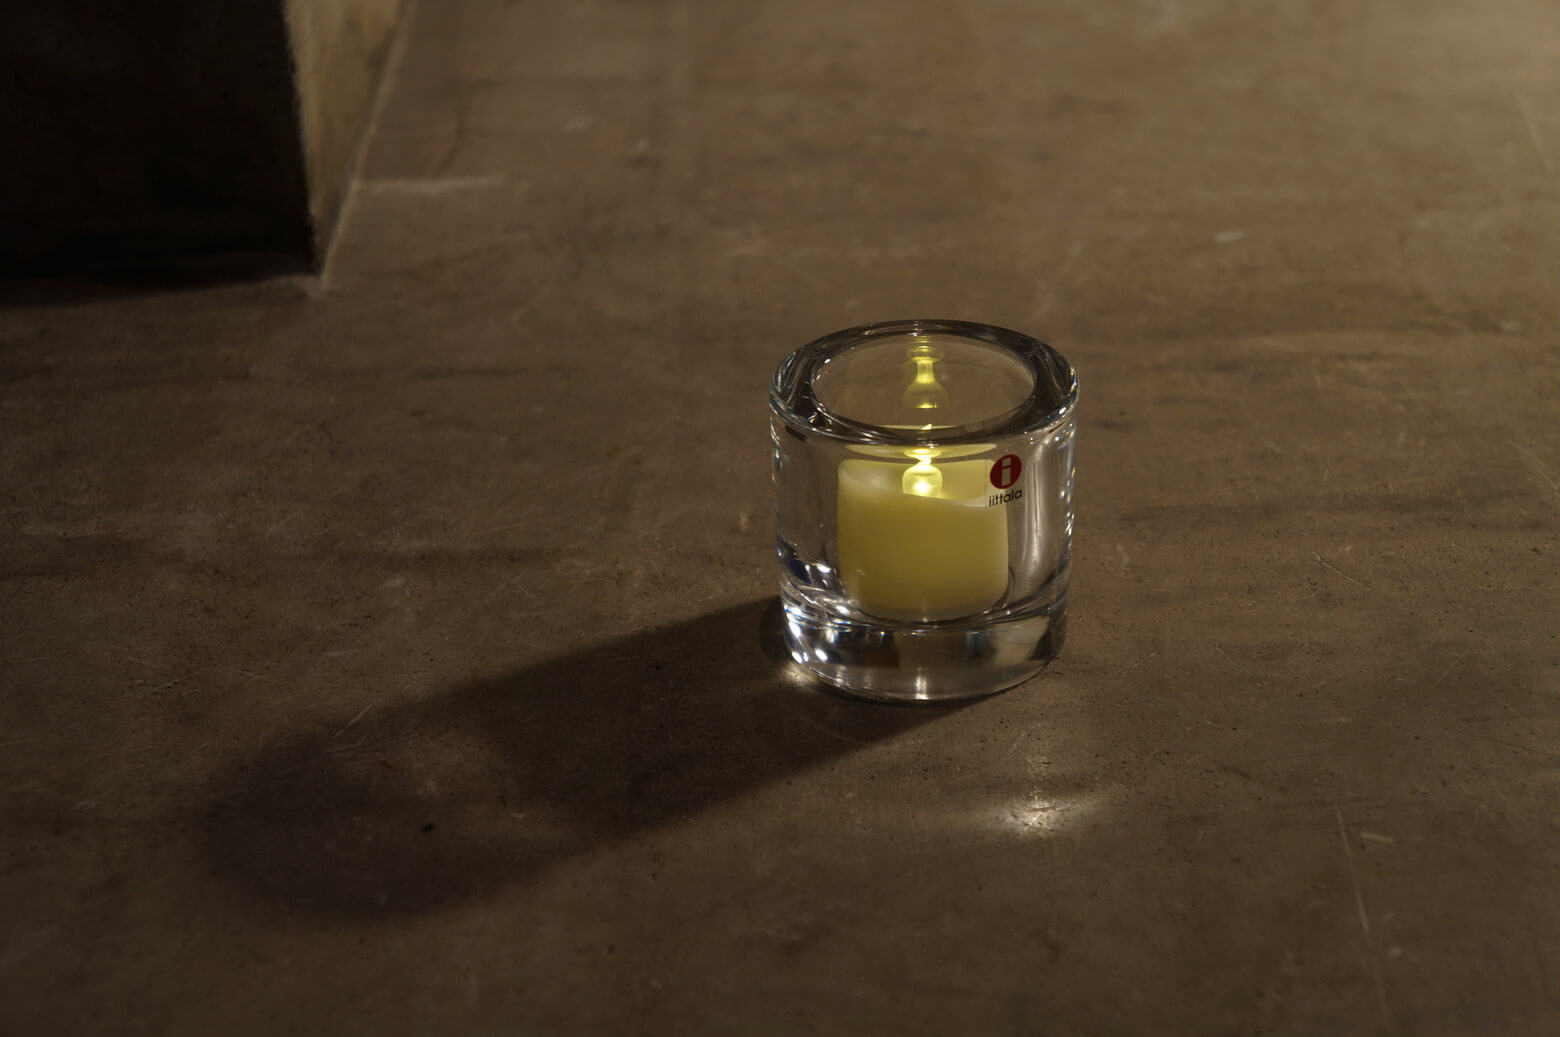 iittala × marimekko Candle Holder Kivi Clear / イッタラ マリメッコ コラボ キャンドル ホルダー キビ クリア